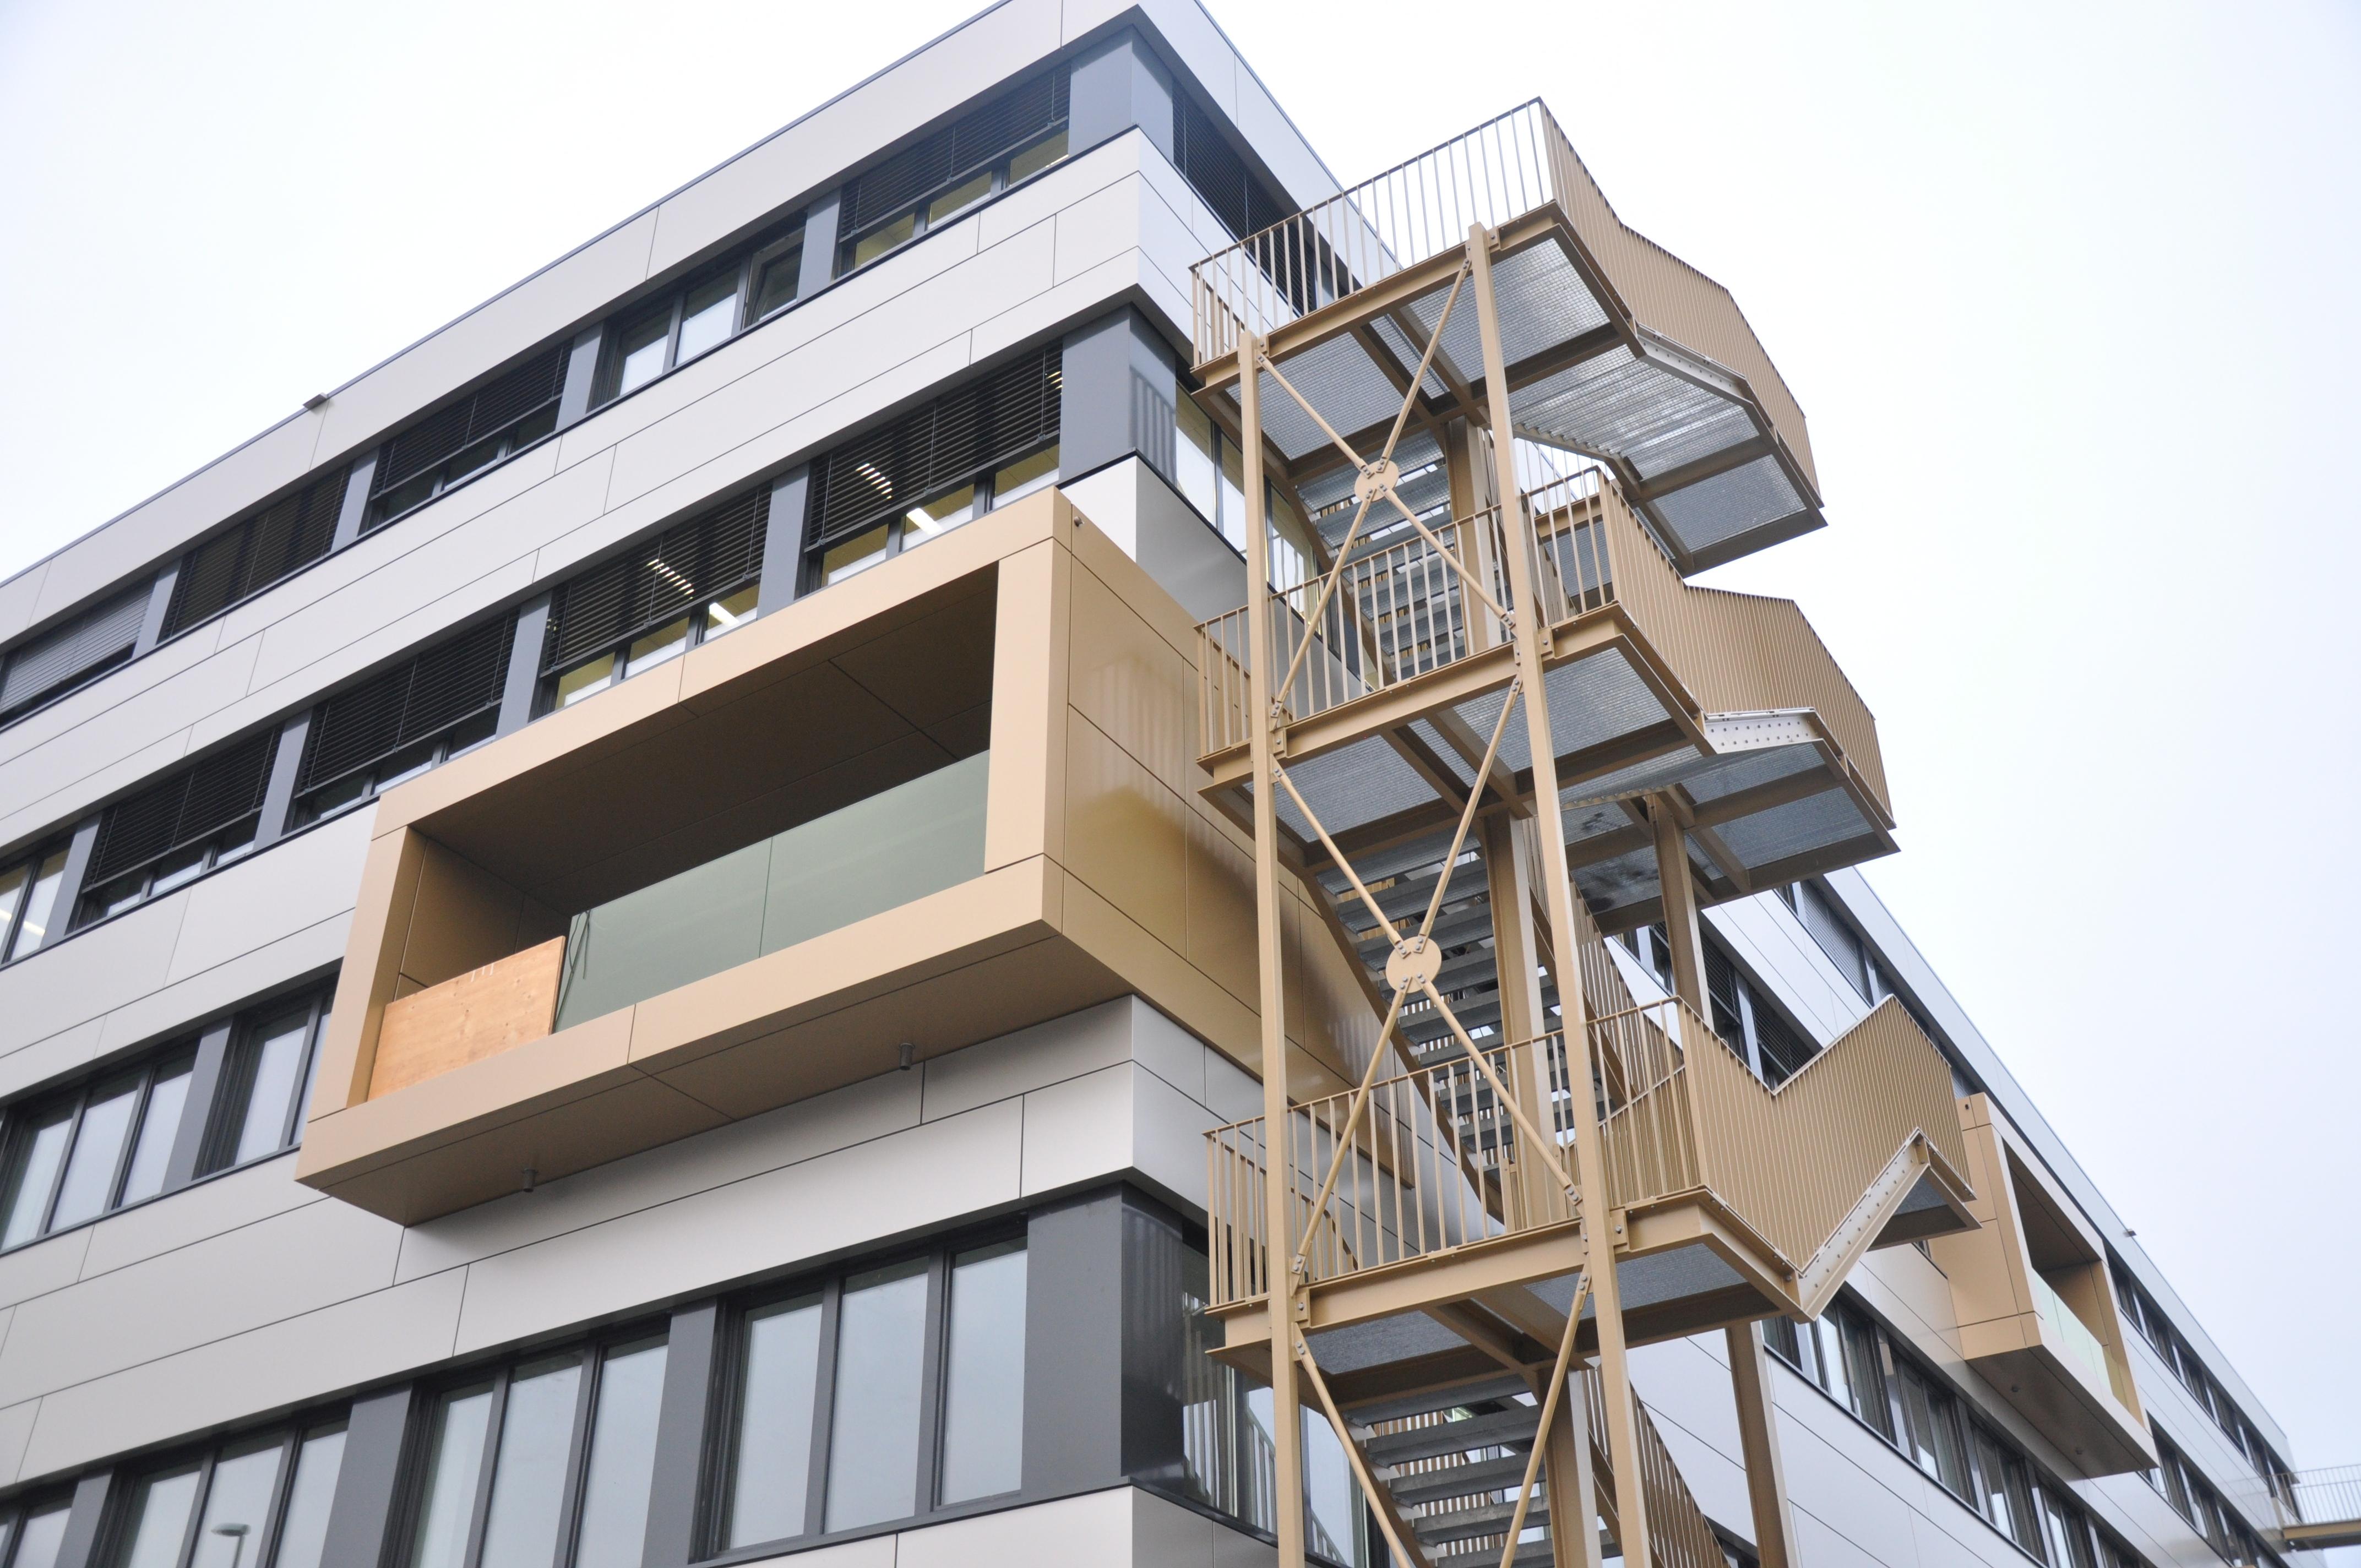 Treppenturm, Allschwil